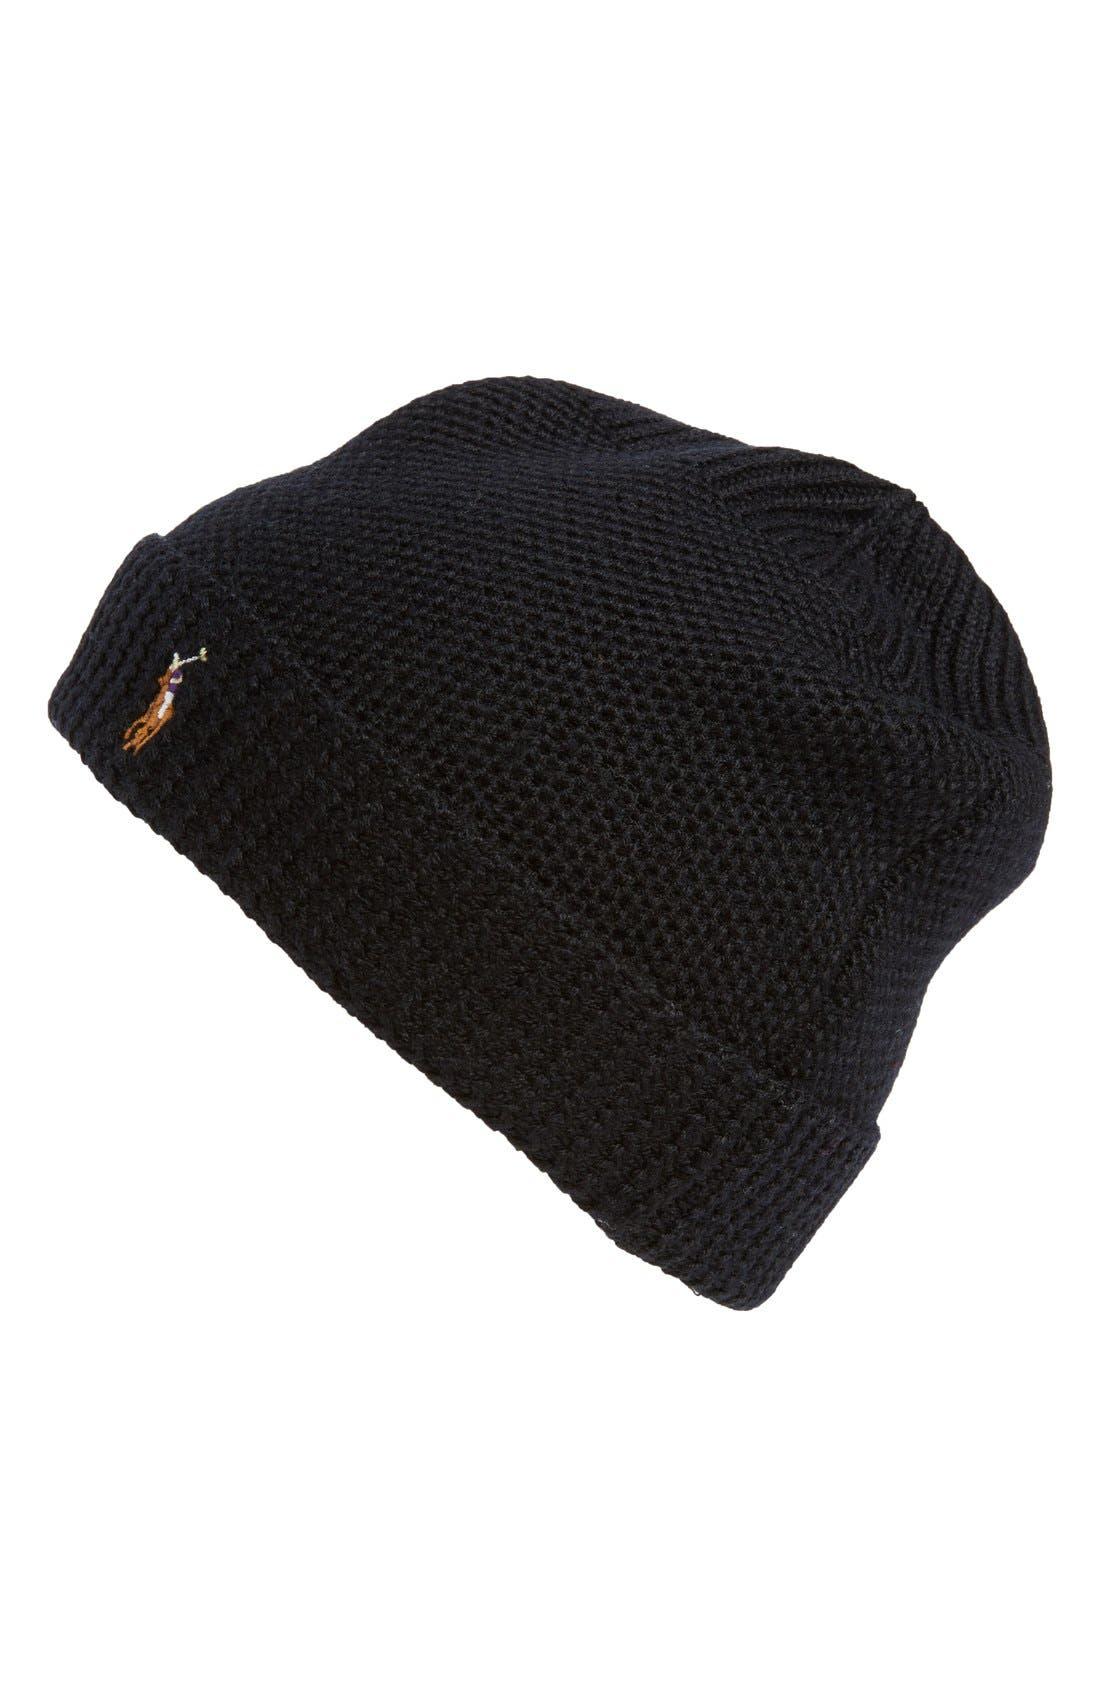 Merino Wool Beanie,                             Main thumbnail 1, color,                             Polo Black